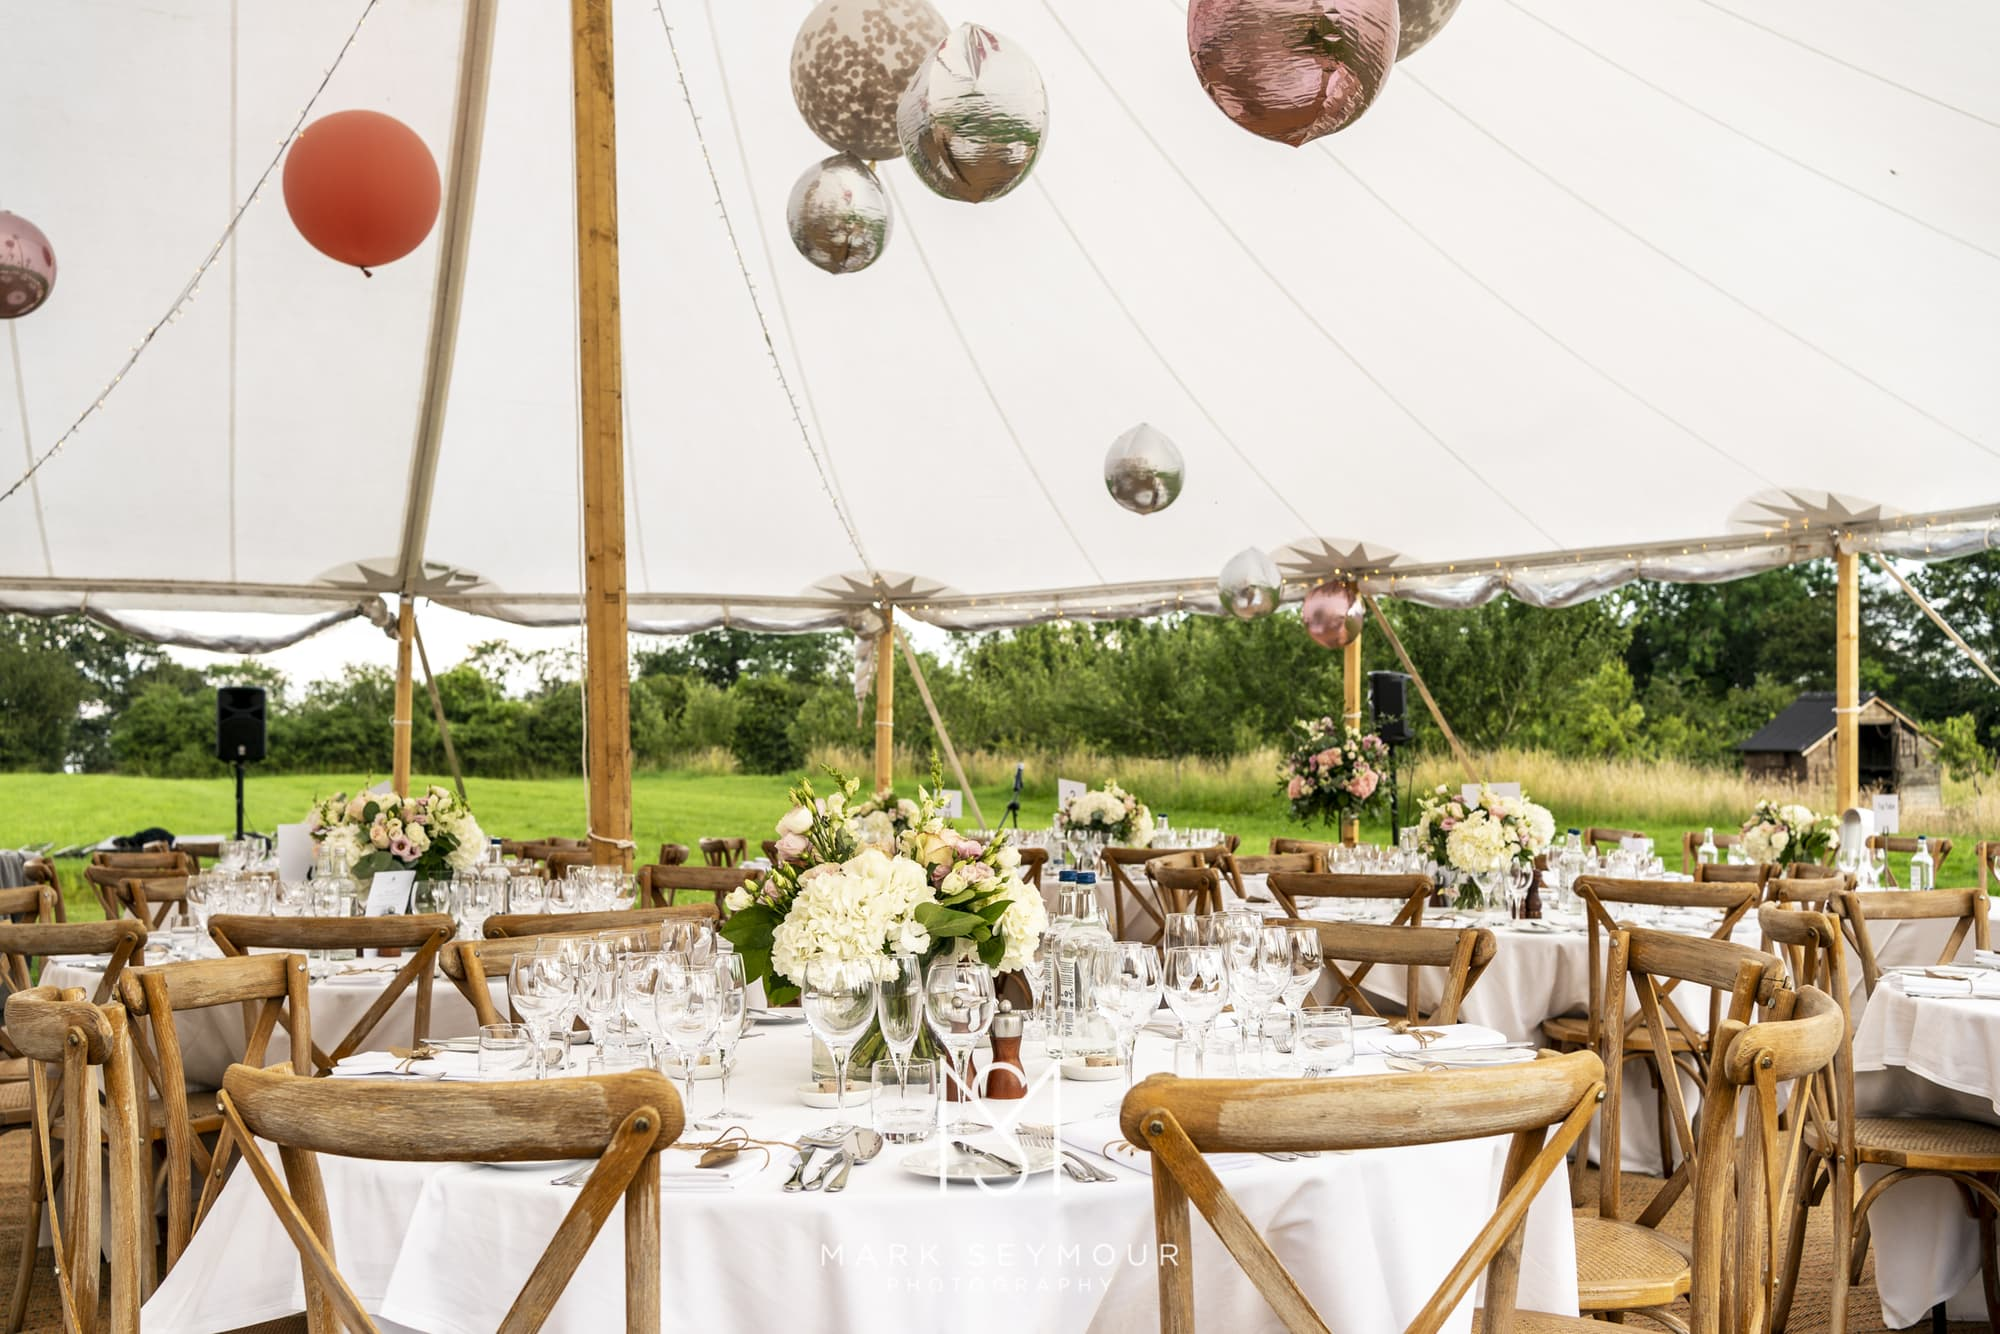 Barnsley House Wedding Photographer - Olivia and James' wedding 20